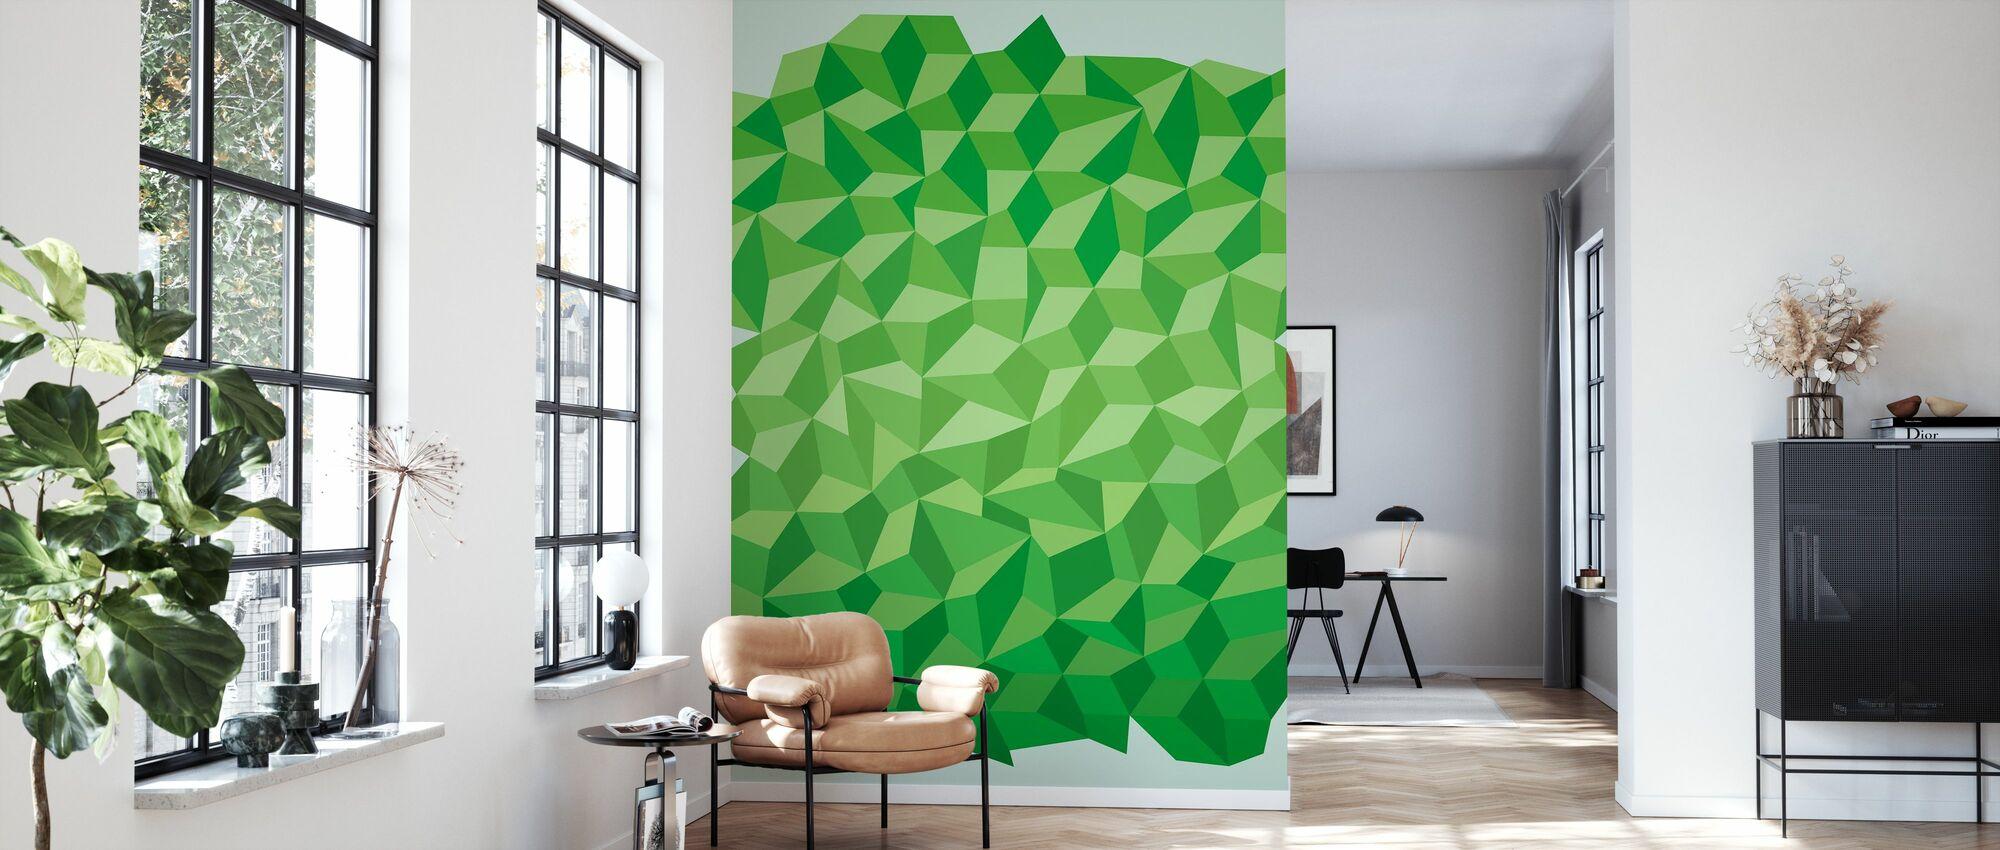 Green Polygon Background - Wallpaper - Living Room